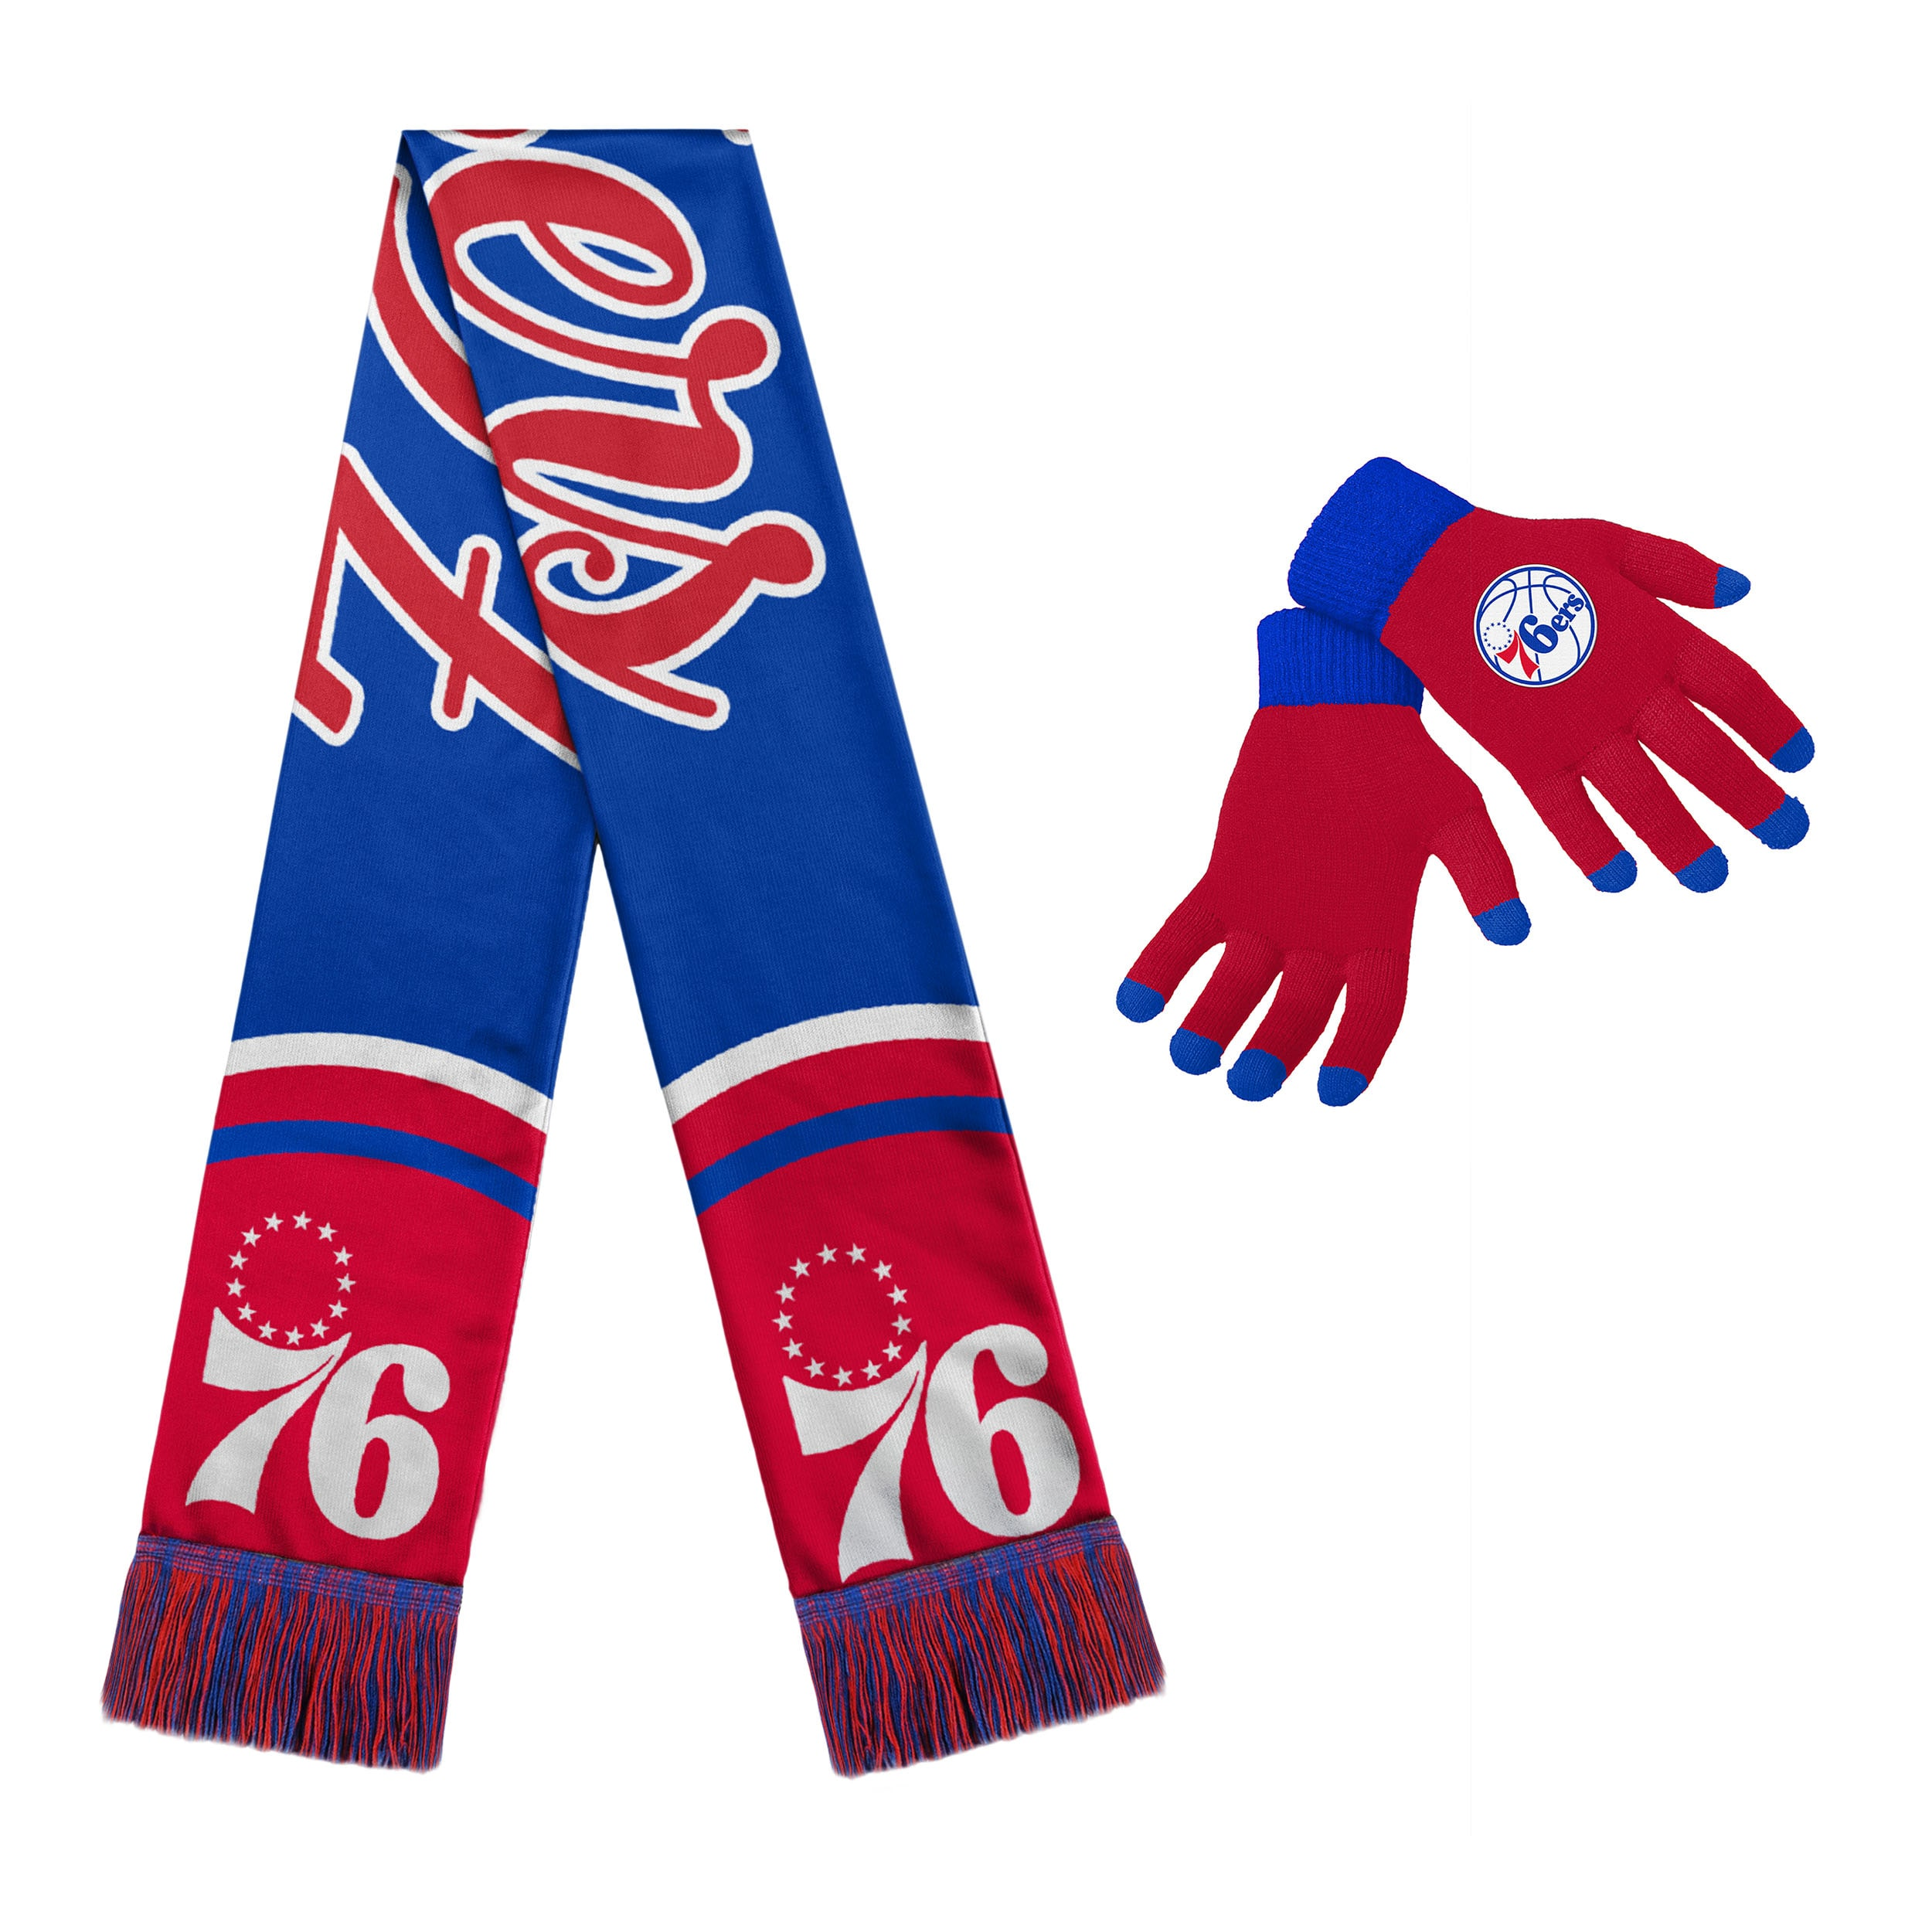 Philadelphia 76ers Women's Glove and Scarf Set